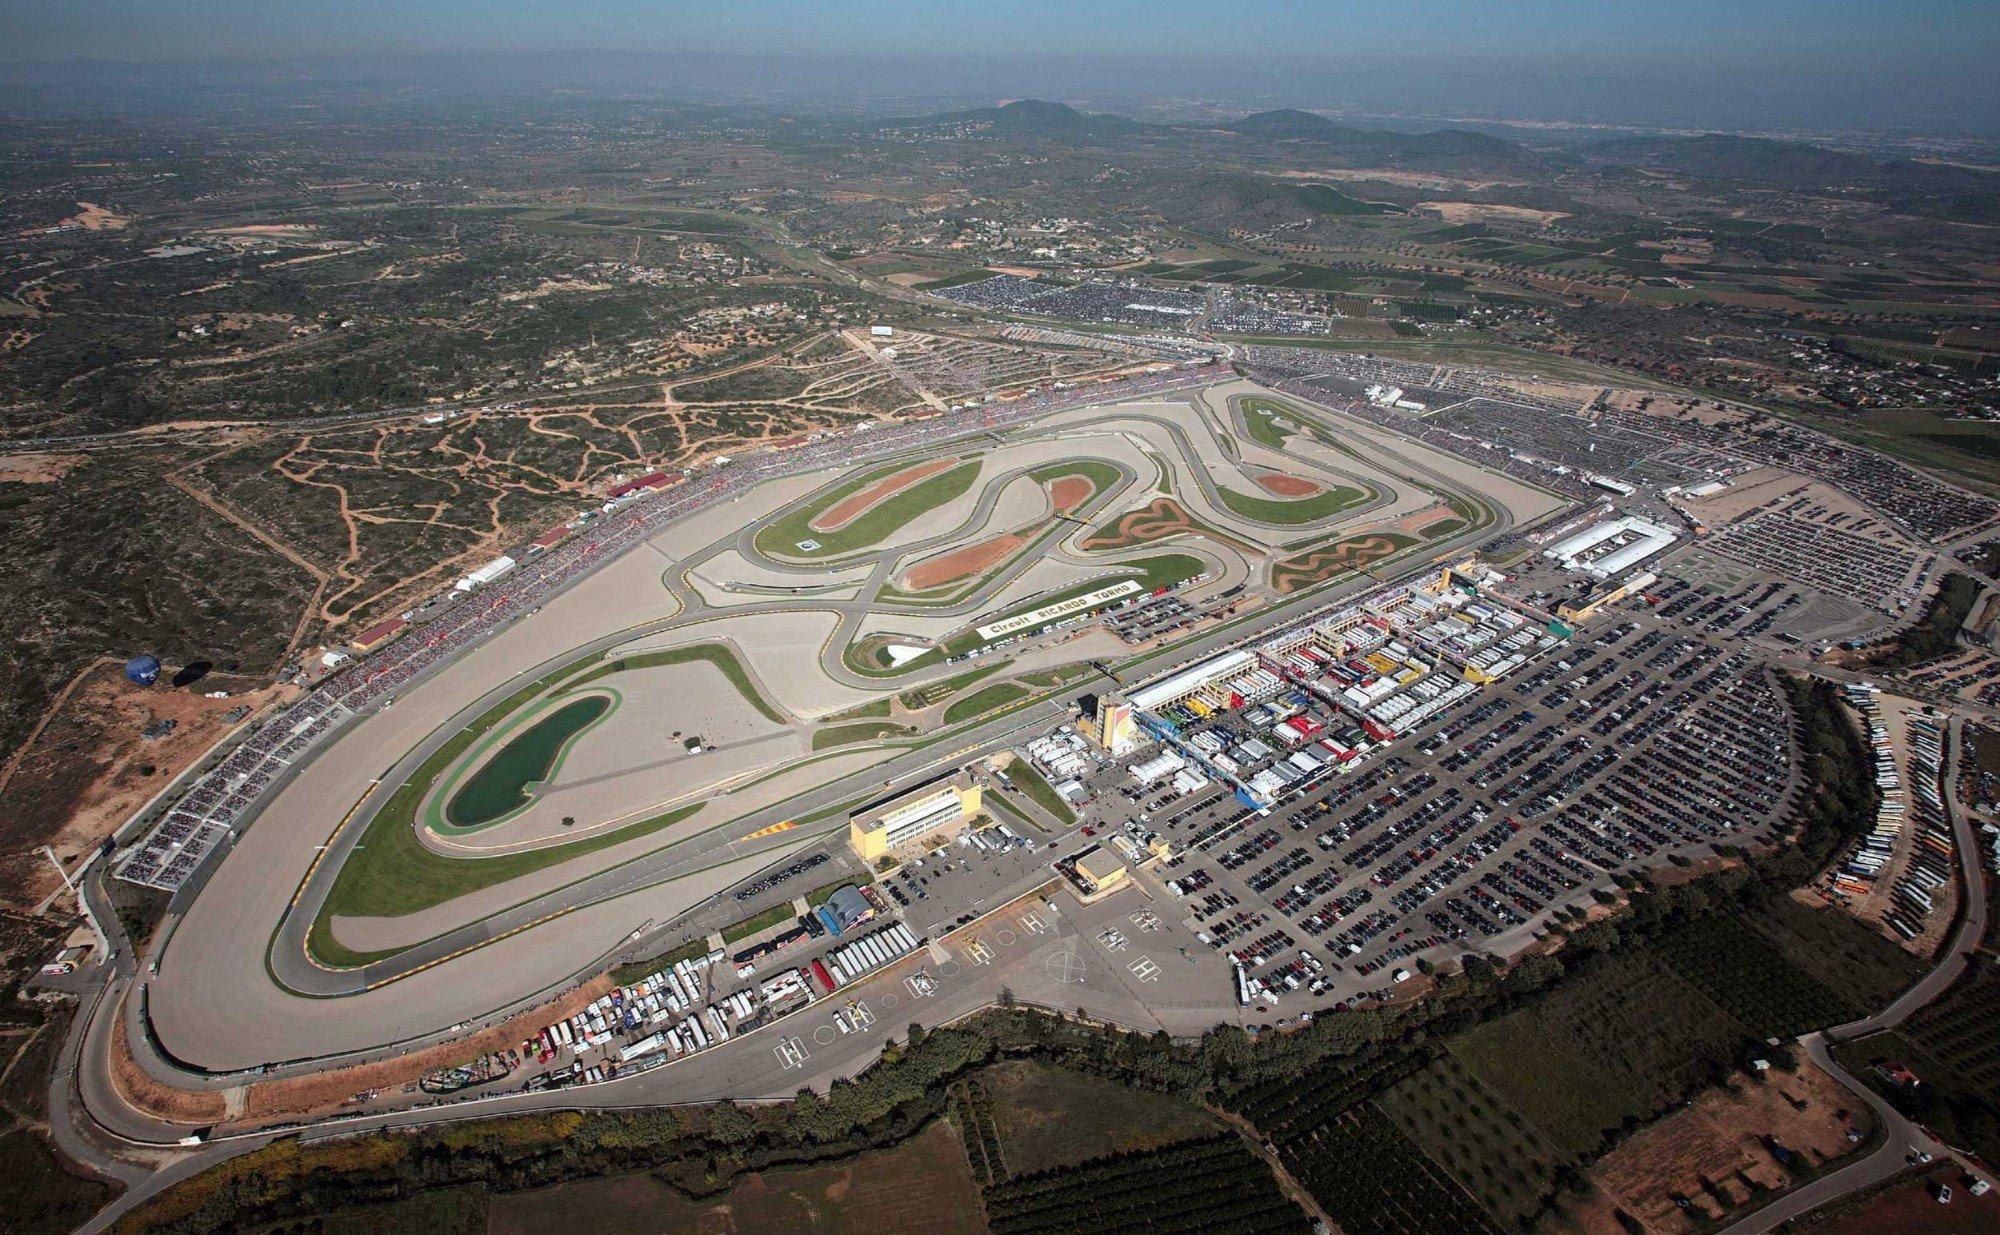 Sky Sport MotoGP, Diretta GP Valencia (14 - 17 Novembre). LIVE su TV8